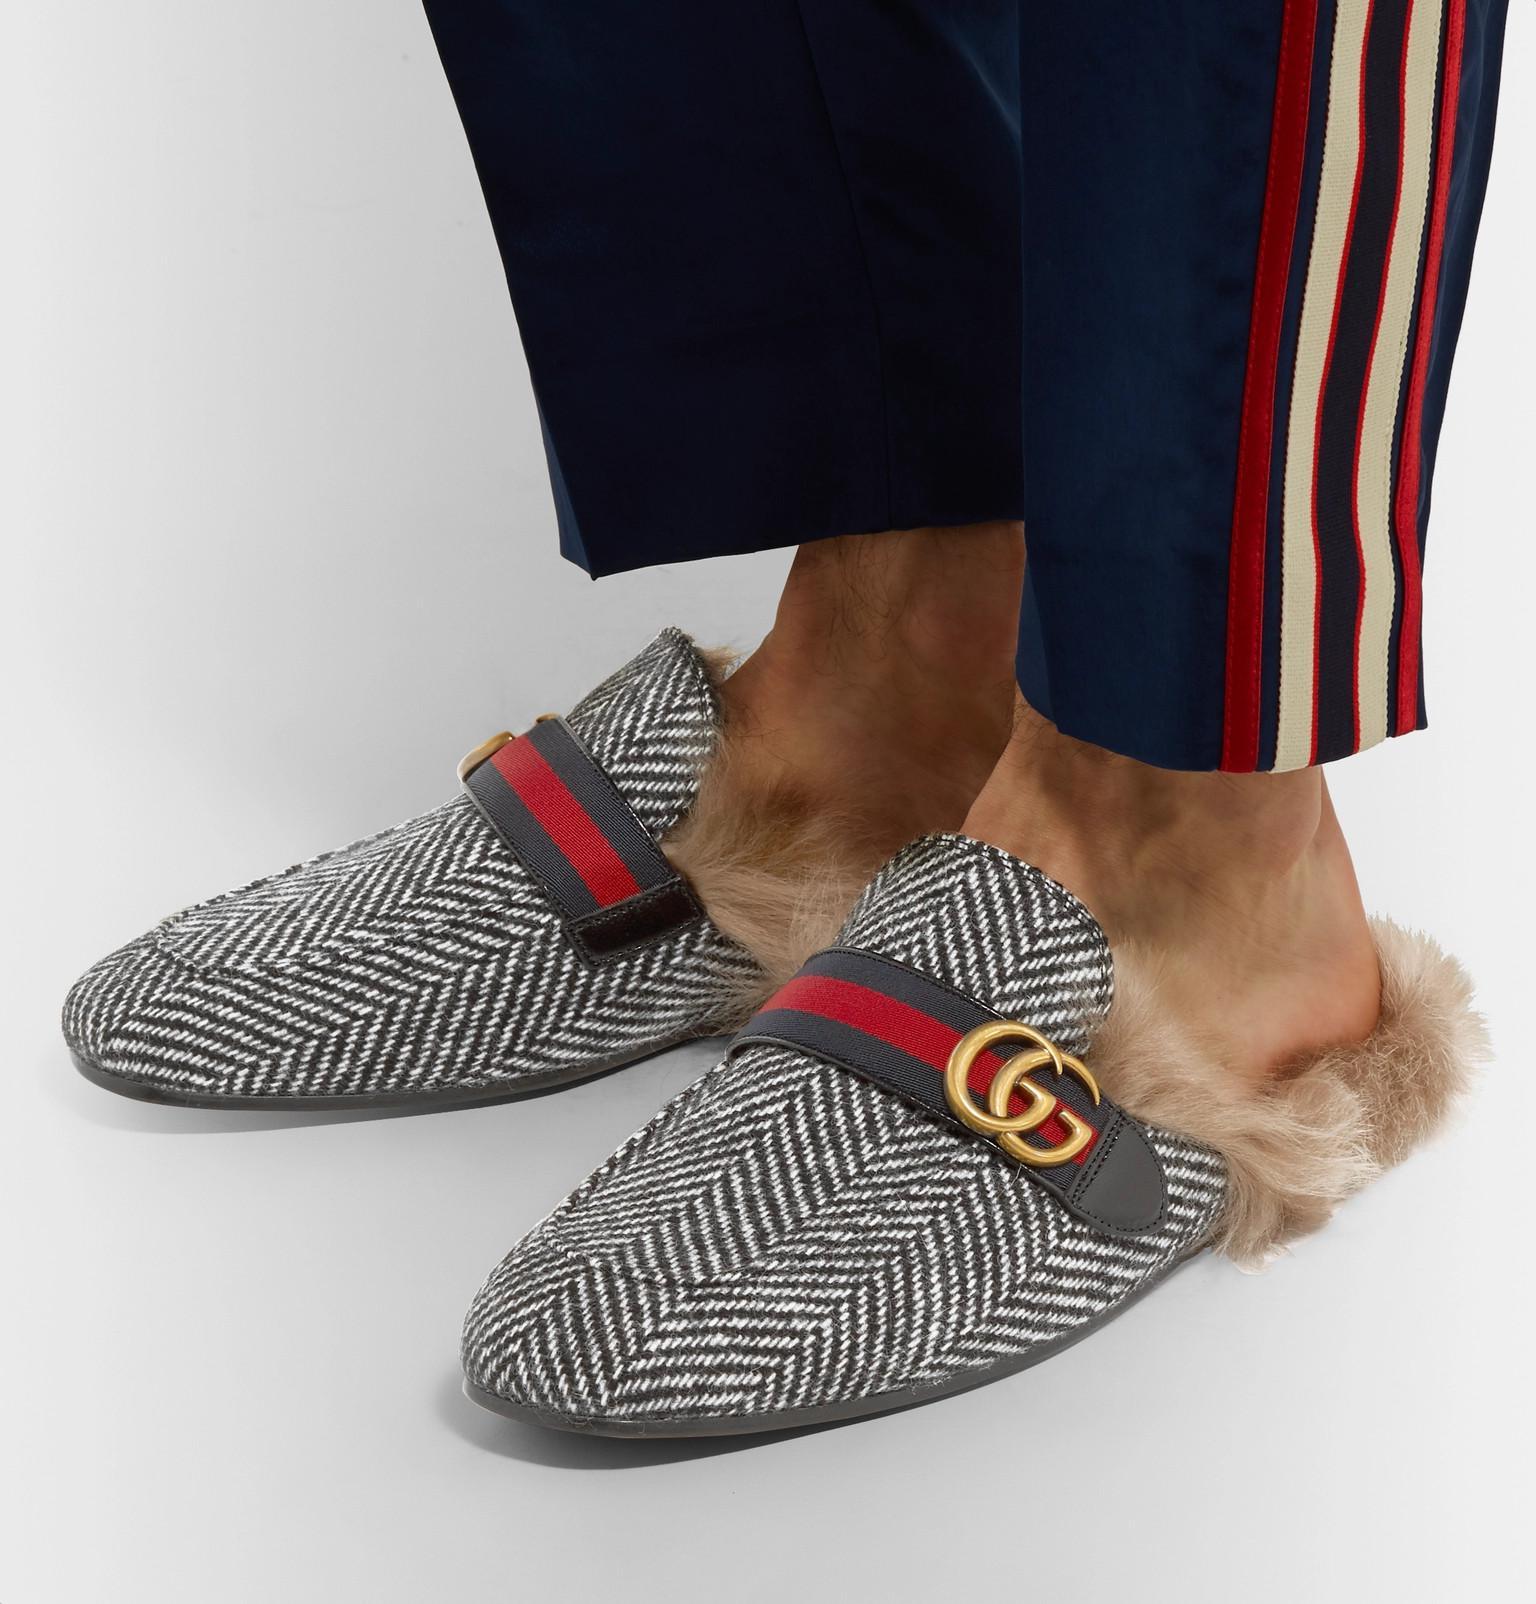 dd20fcf4b3b Gucci Princetown Shearling-lined Herringbone Wool Backless Loafers ...